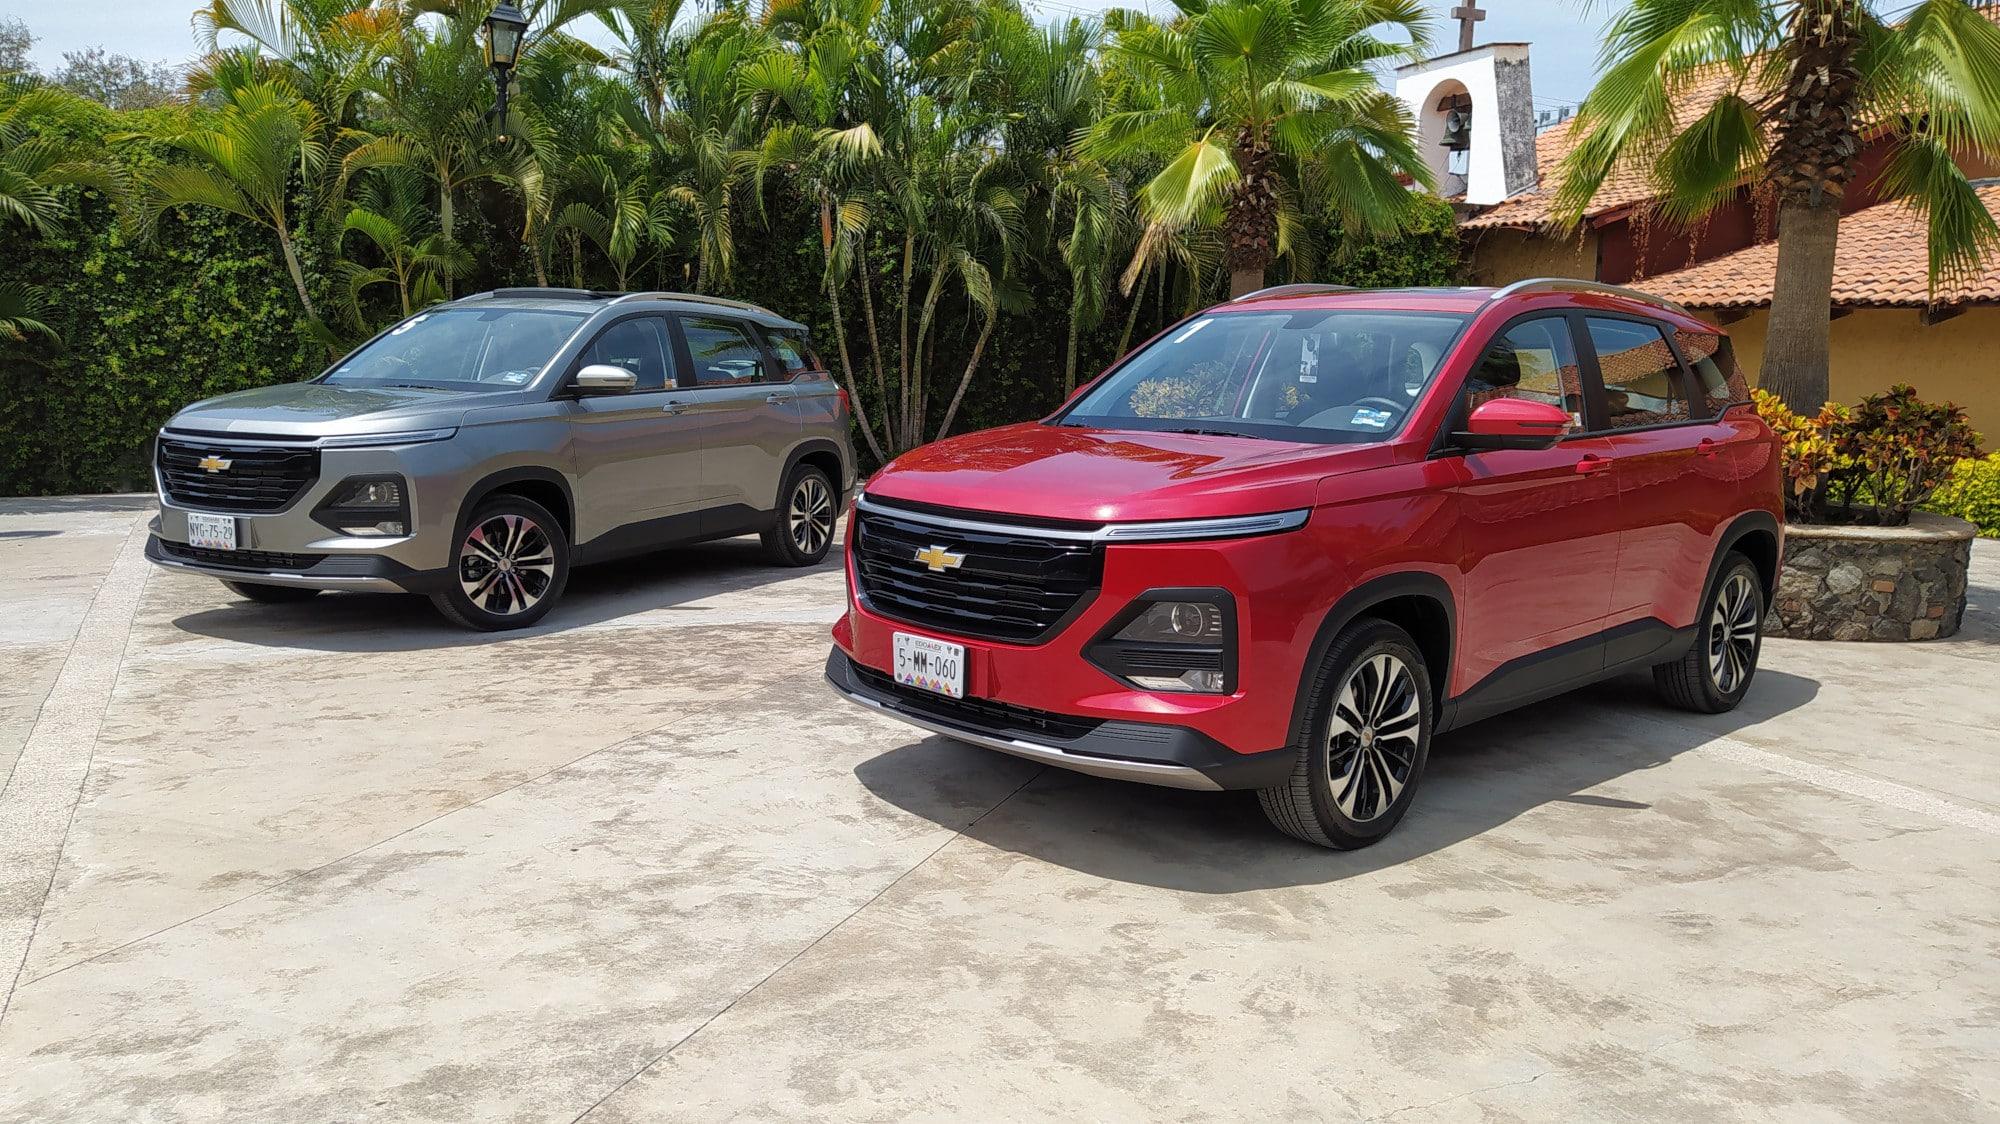 Chevrolet Captiva 2022, para viajes en familia